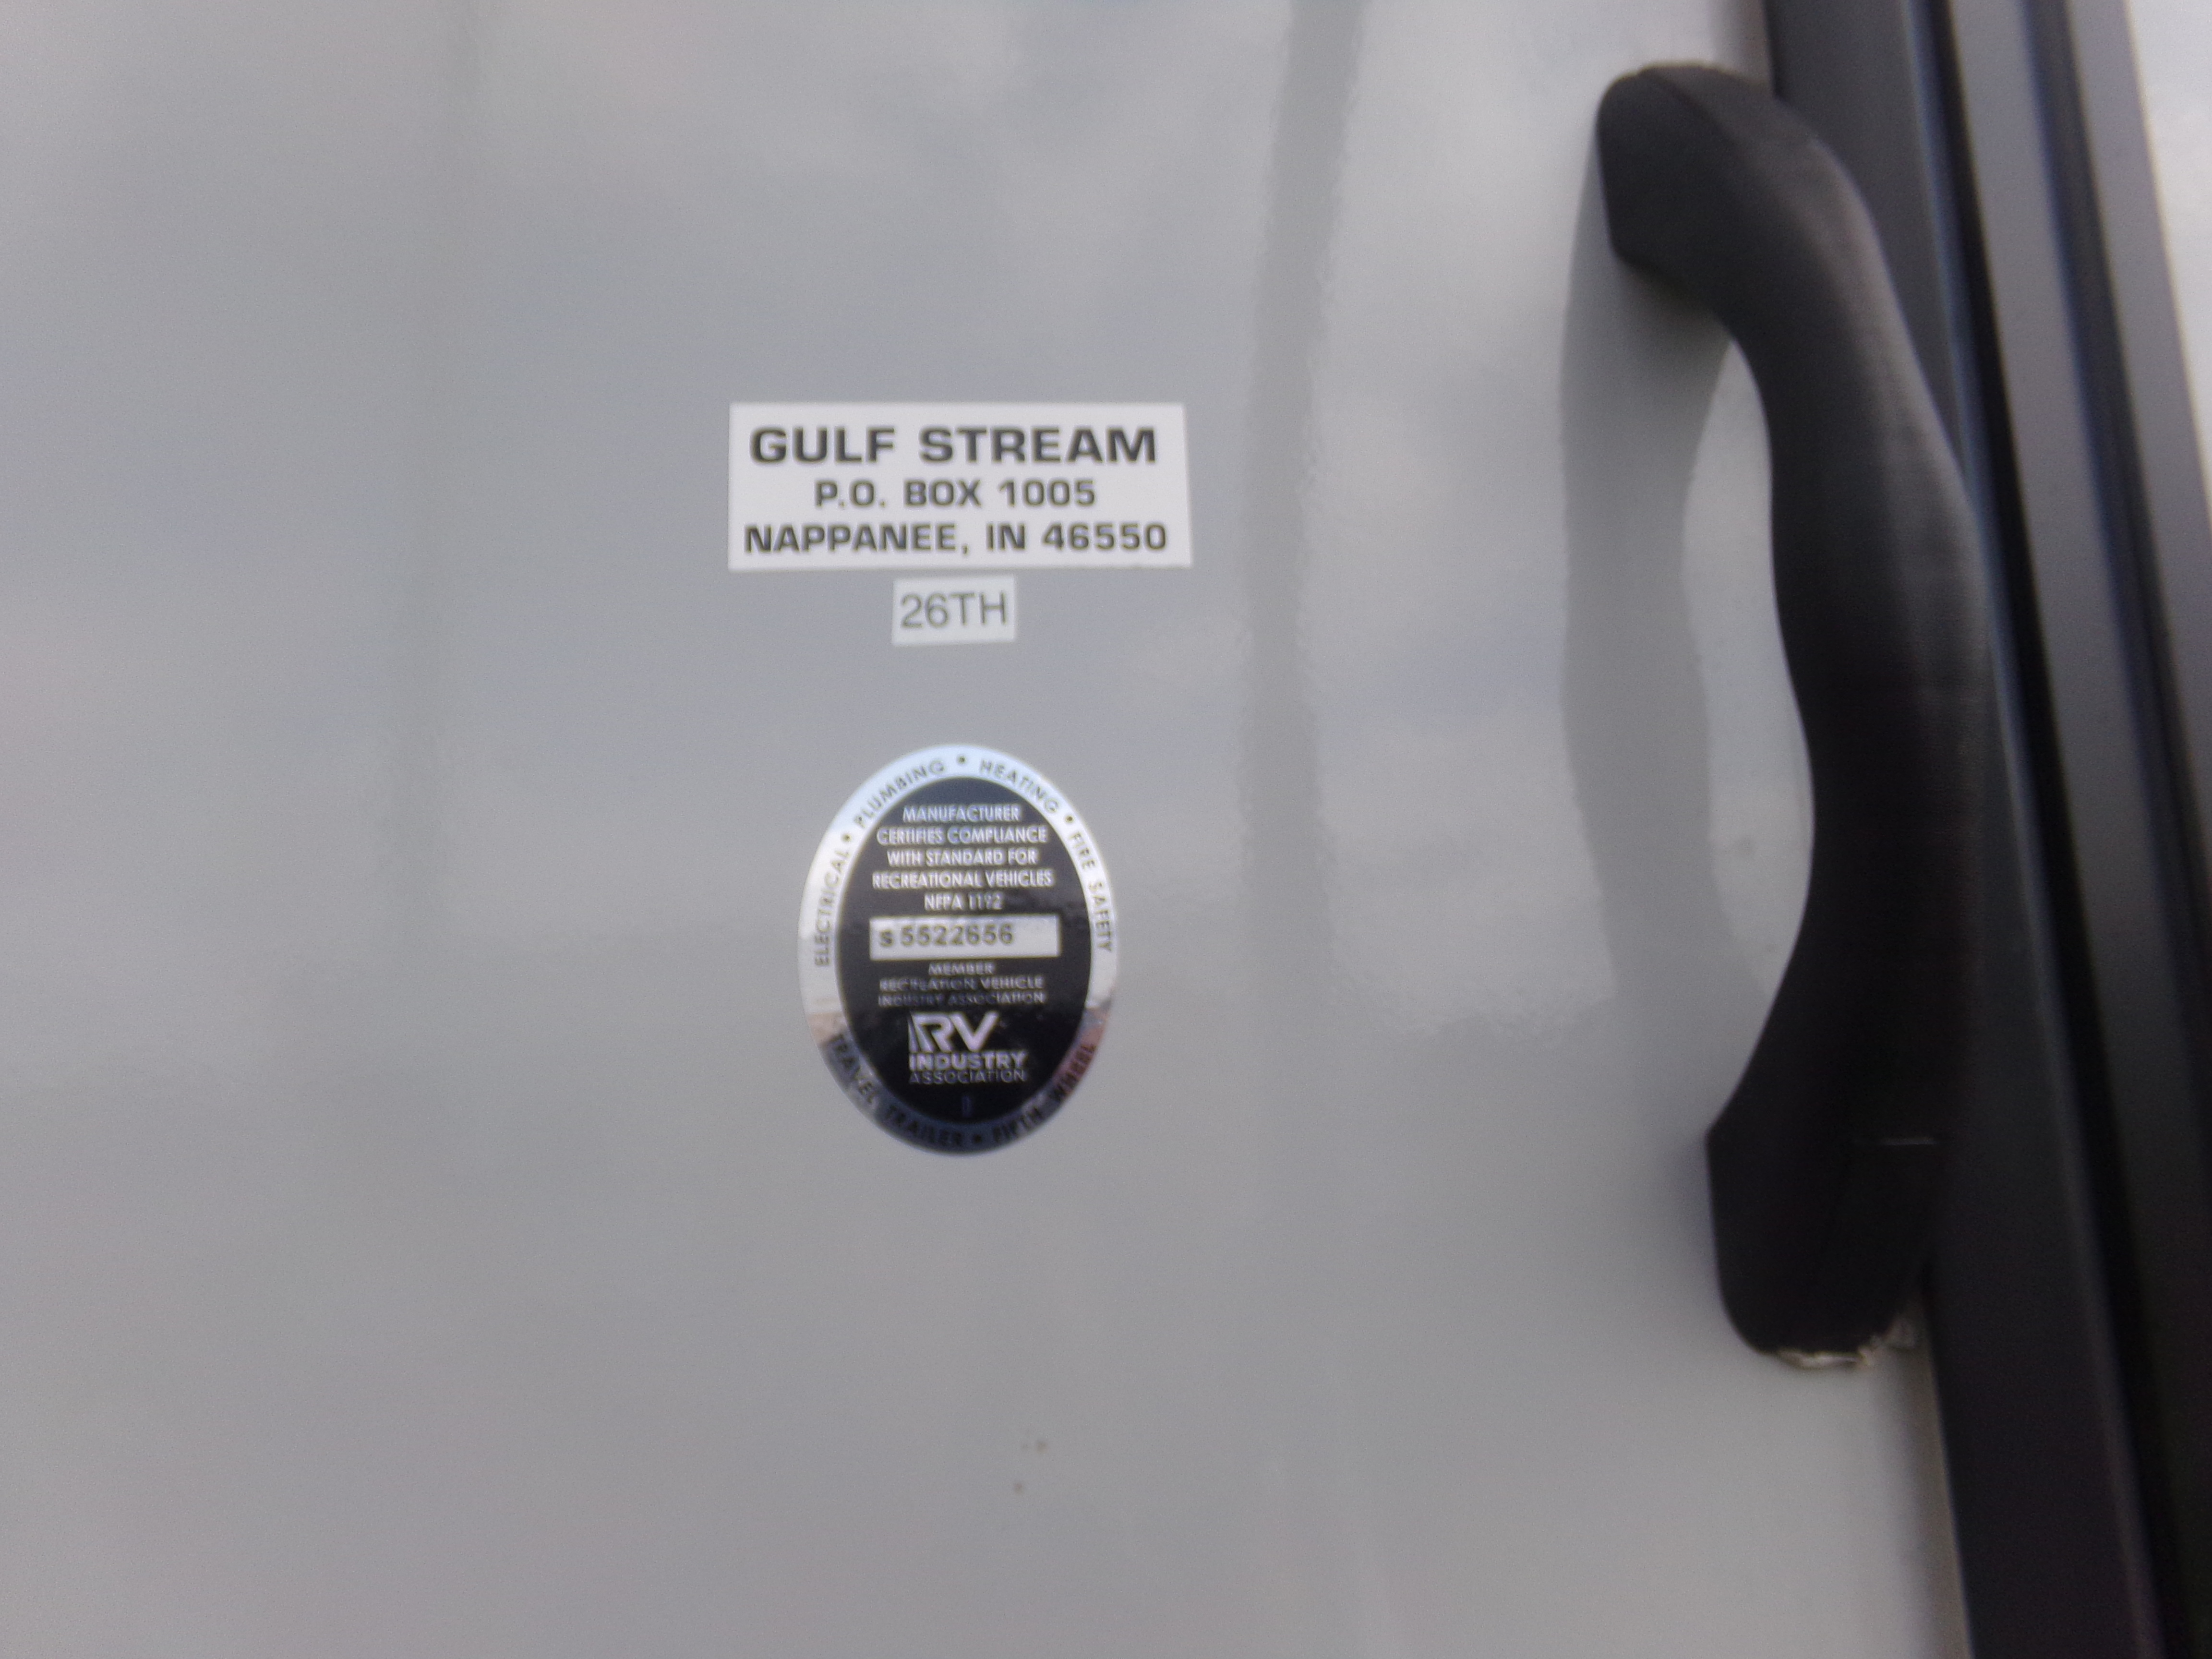 New 2020 Gulftstream GSX G26 Toy Hauler